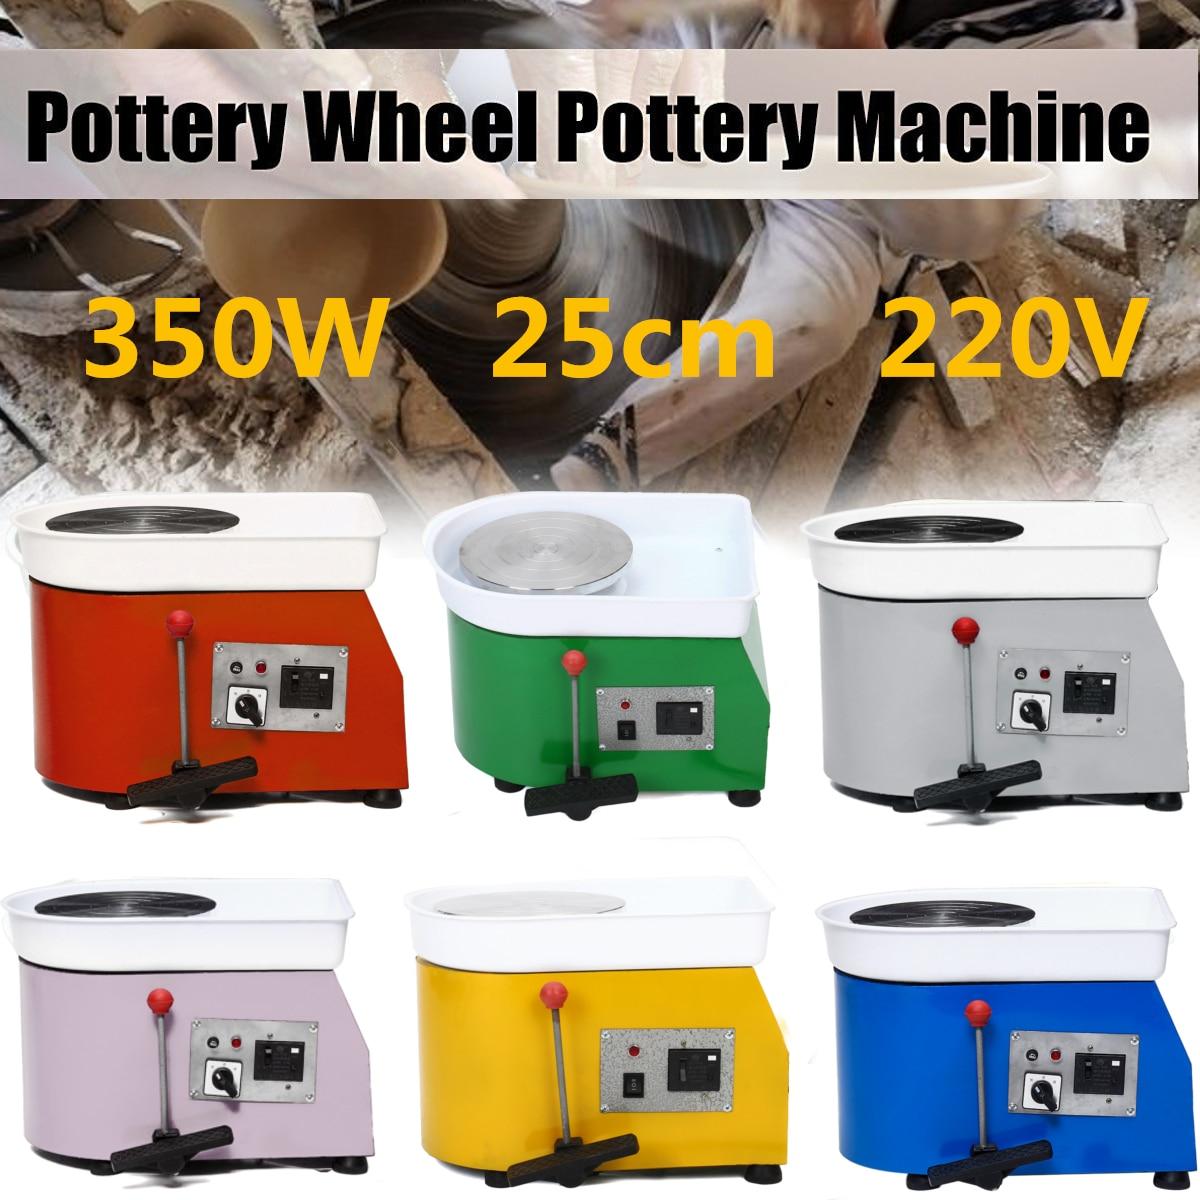 25cm 350W Pottery Wheel Pottery DIY Clay Machine For Ceramic Work Ceramics Clay 220V Children Learning Machine 25cm 350w pottery wheel pottery diy clay machine for ceramic work ceramics clay 220v children learning machine